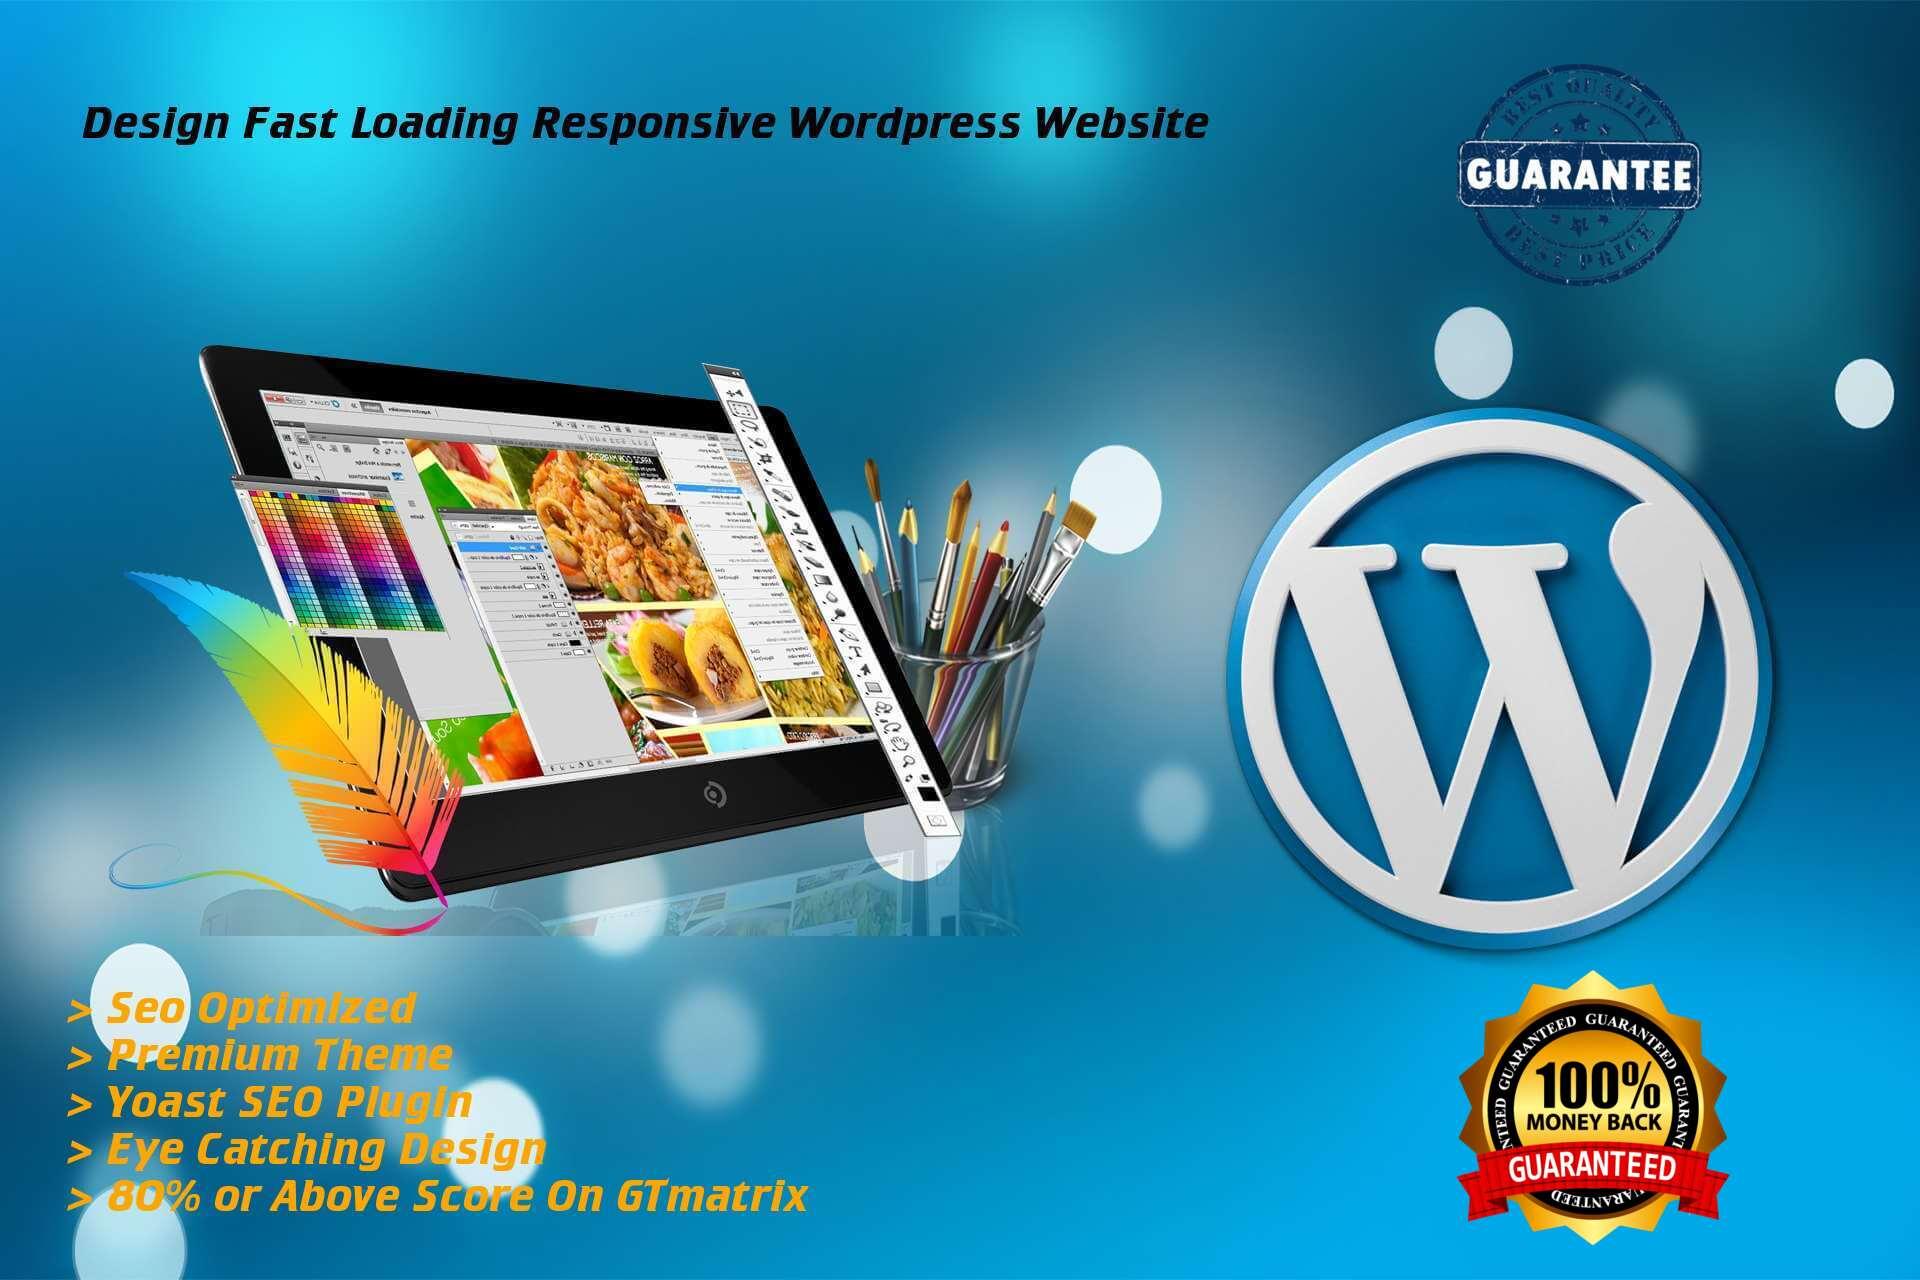 I will design fast loading responsive wordpress website